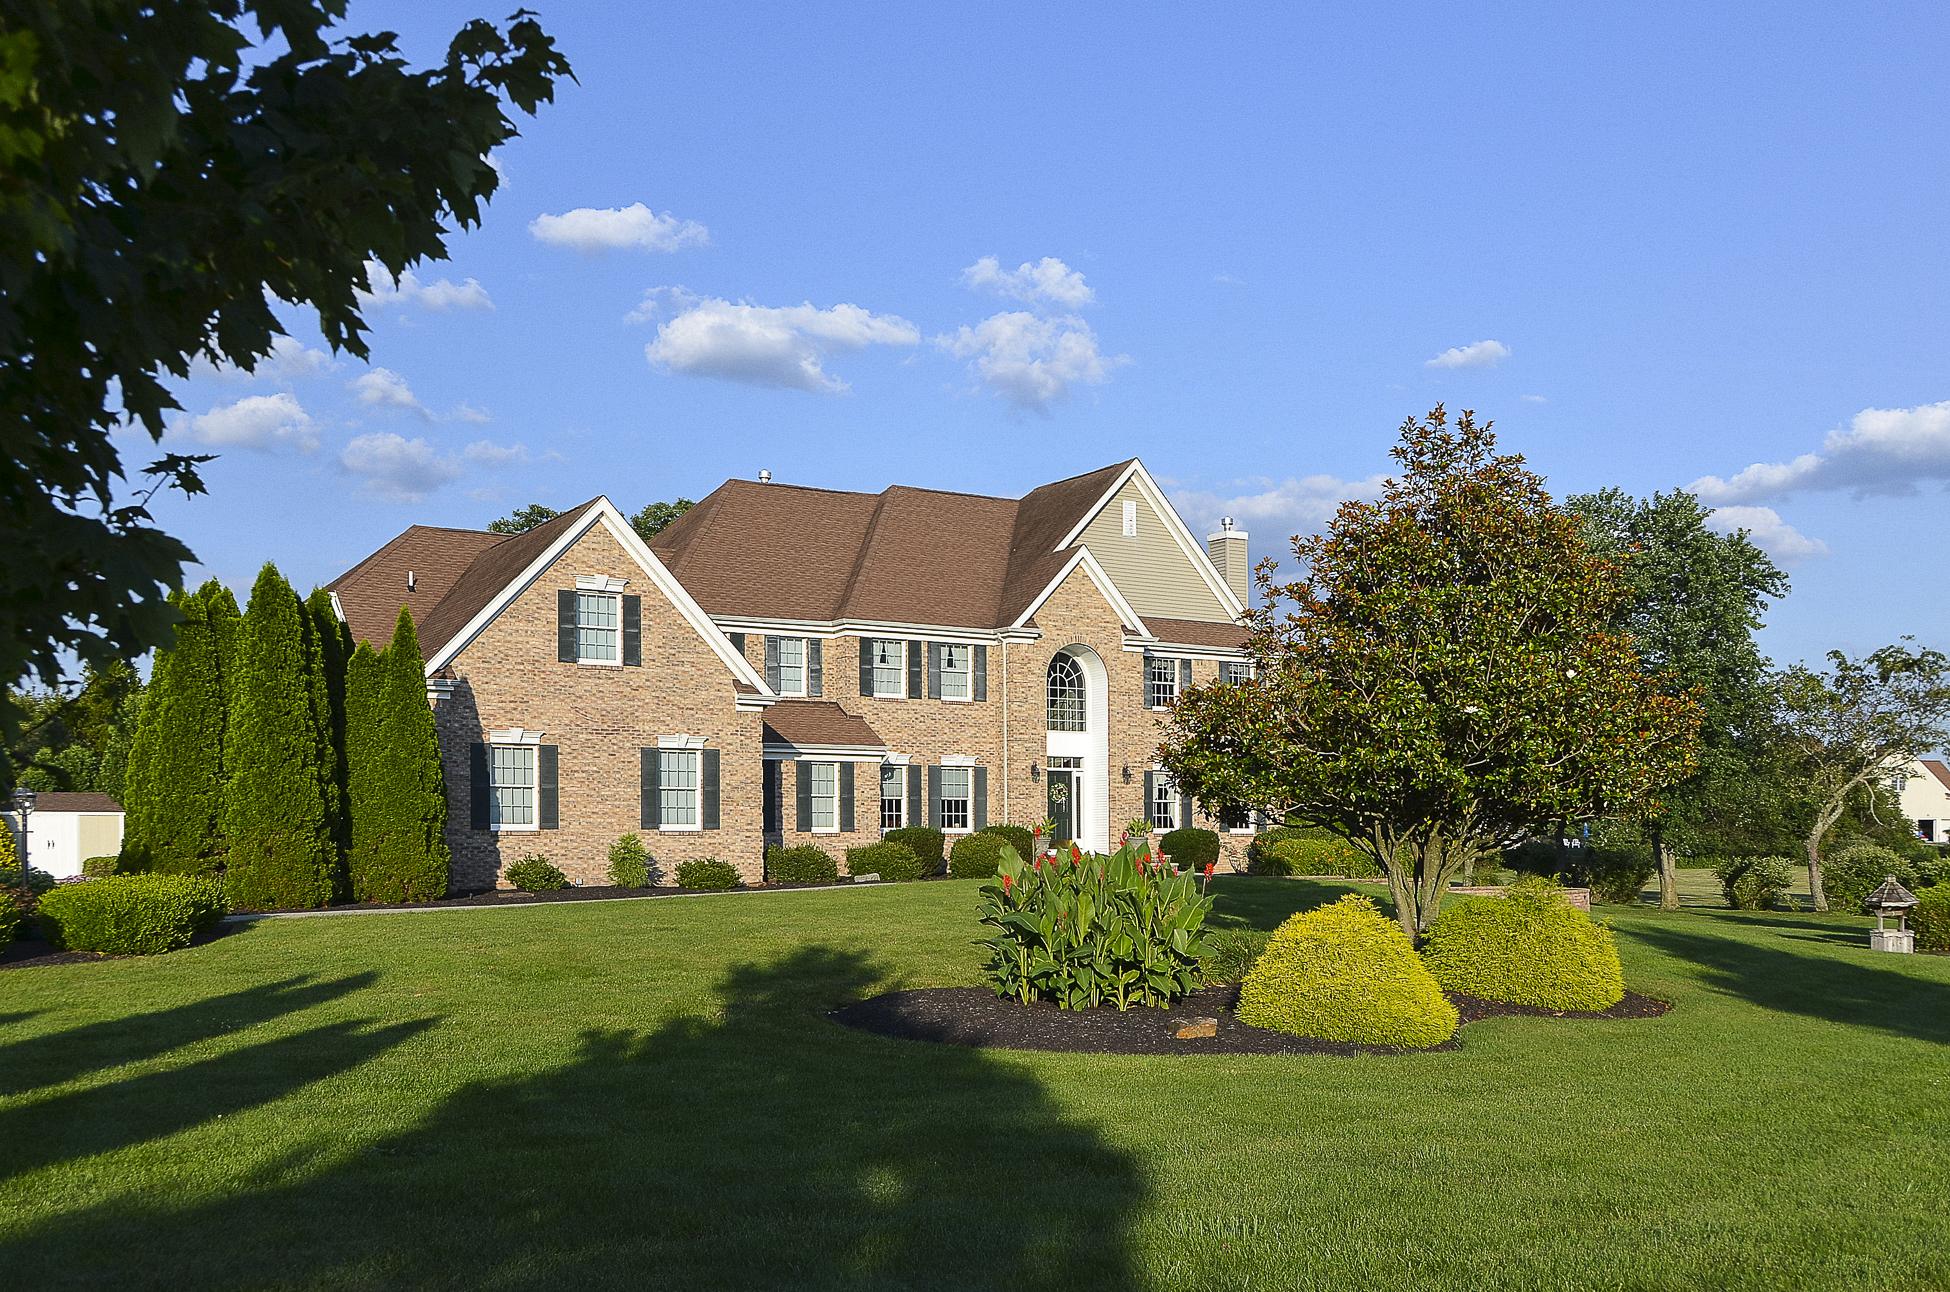 独户住宅 为 销售 在 Be Prepared To Fall In Love - Hopewell Township 22 Hunters Ridge Drive Pennington, 新泽西州 08534 美国